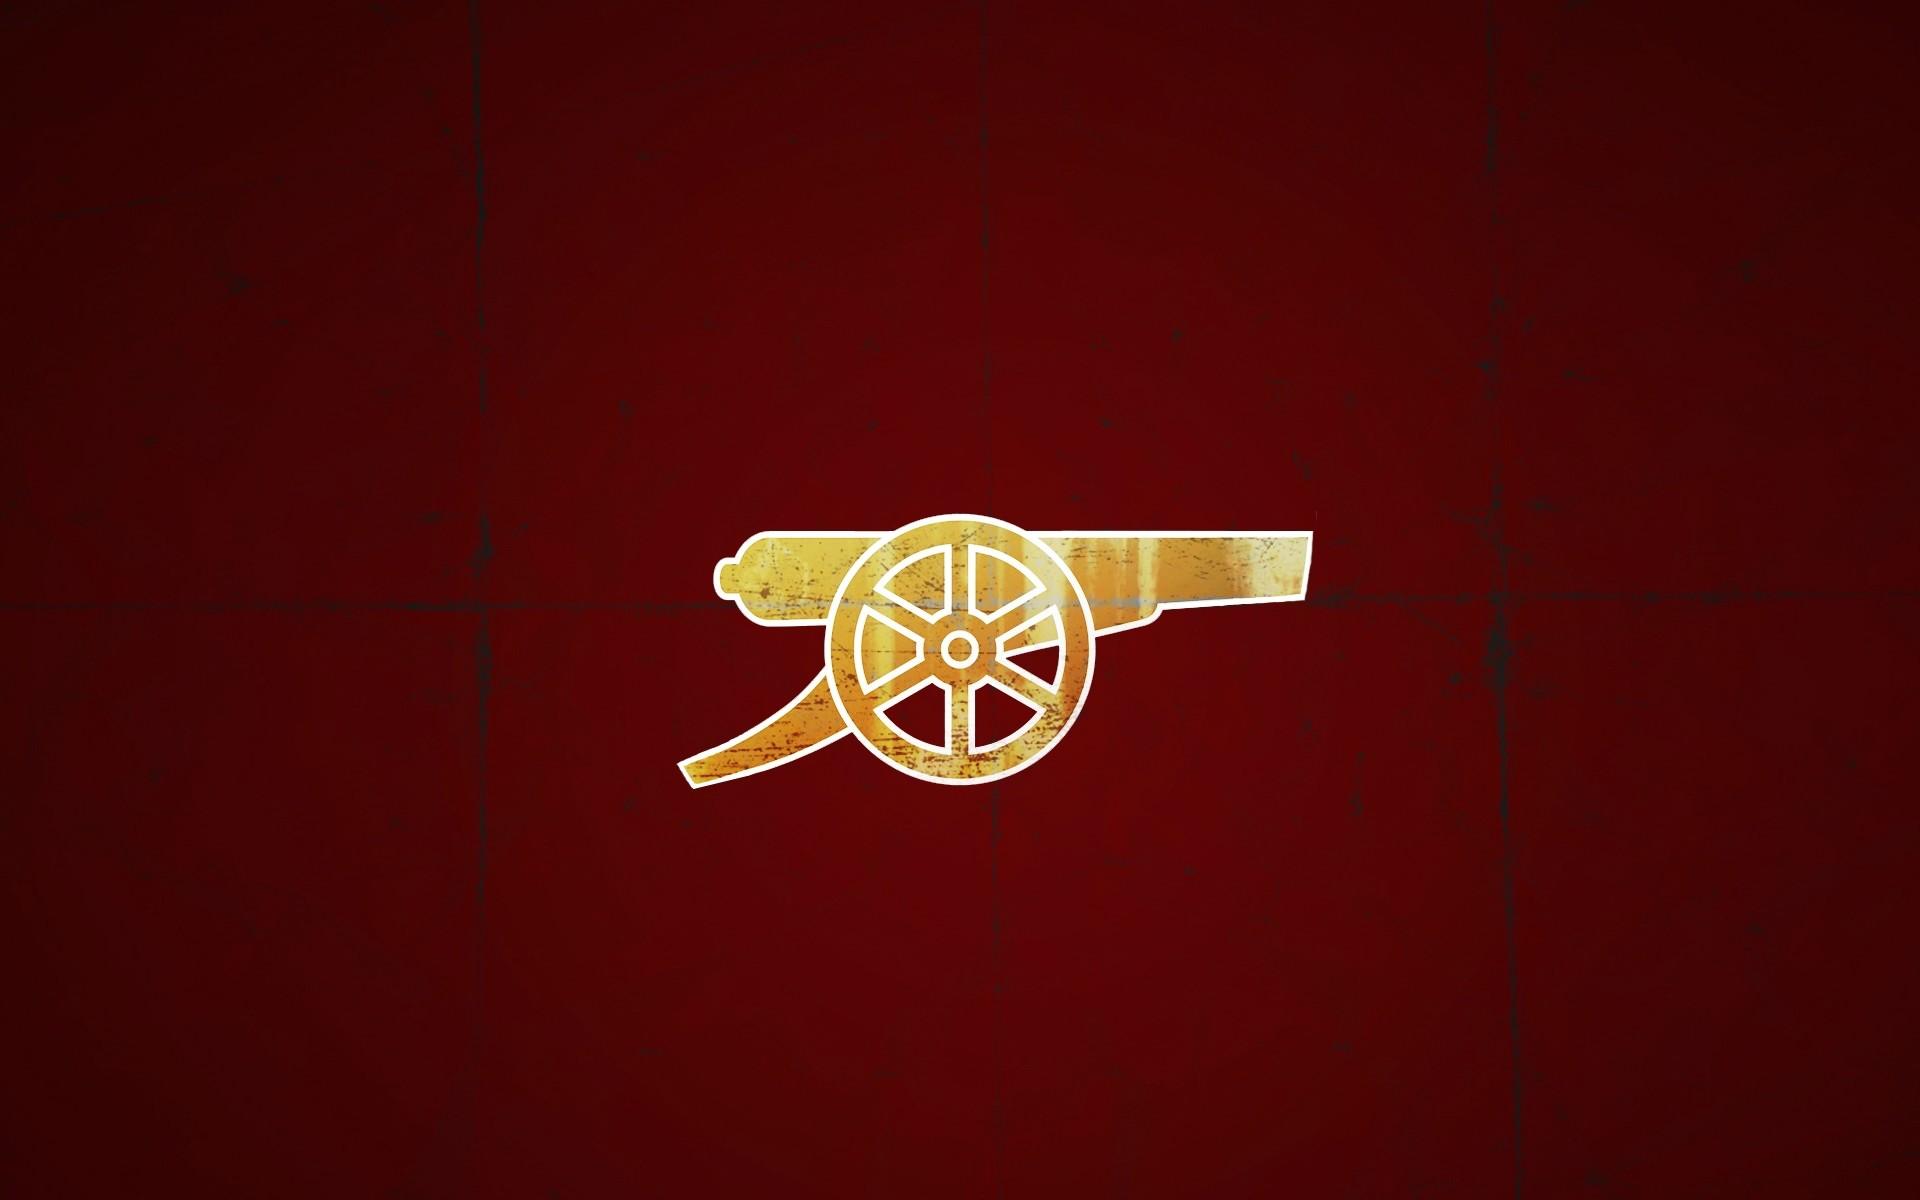 Arsenal cannon